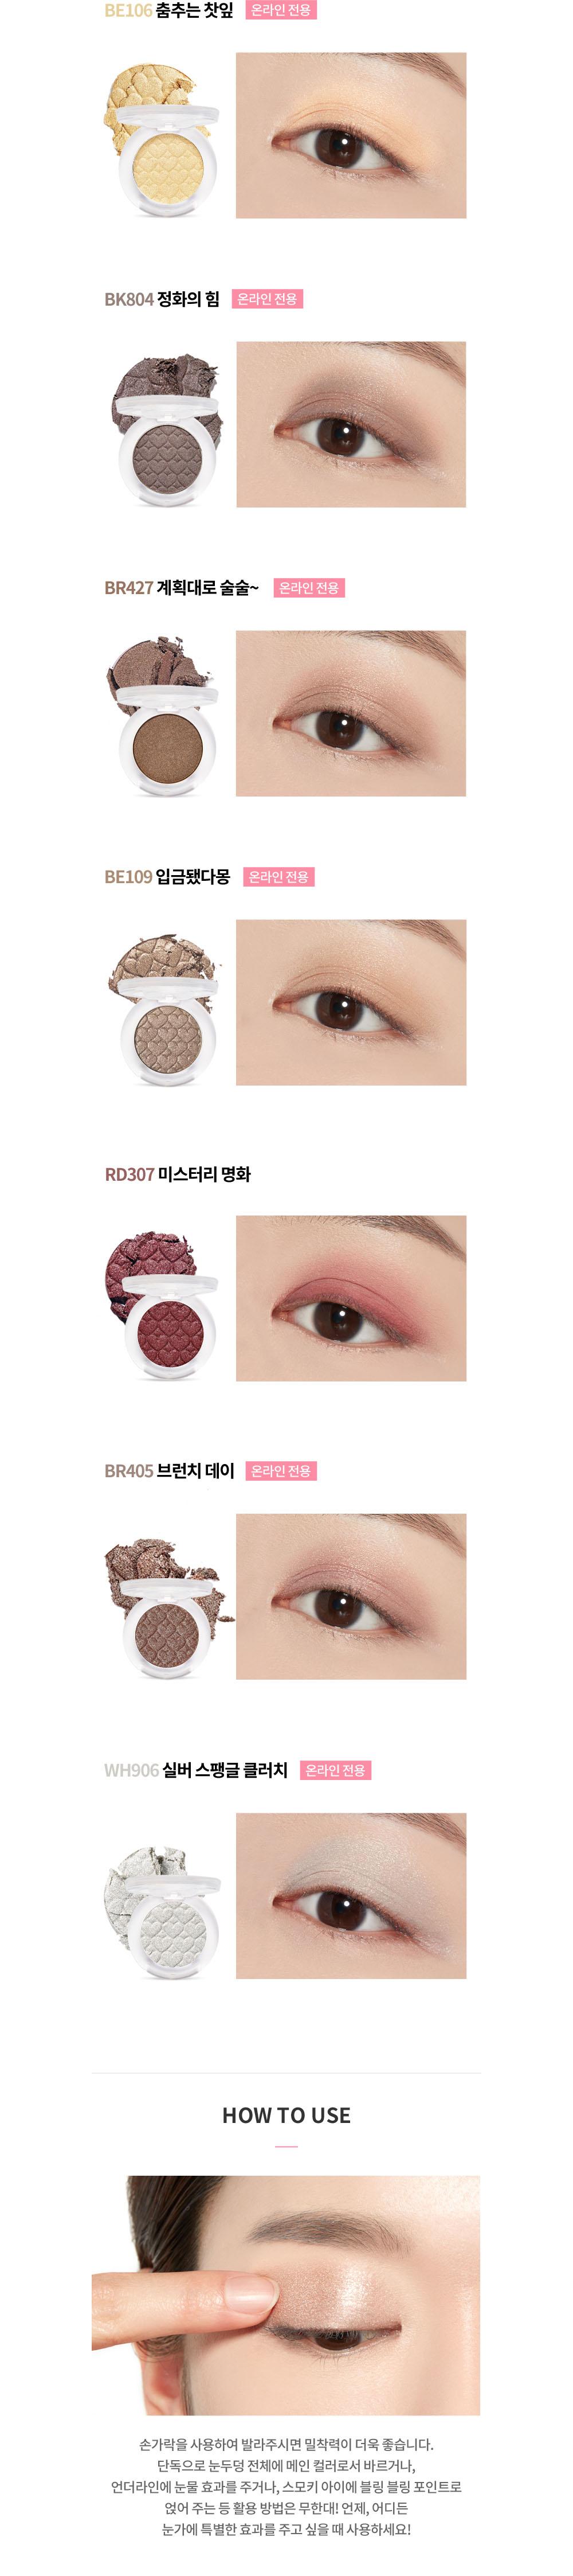 ETUDE HOUSE Look At My Eyes 2g #Makeup